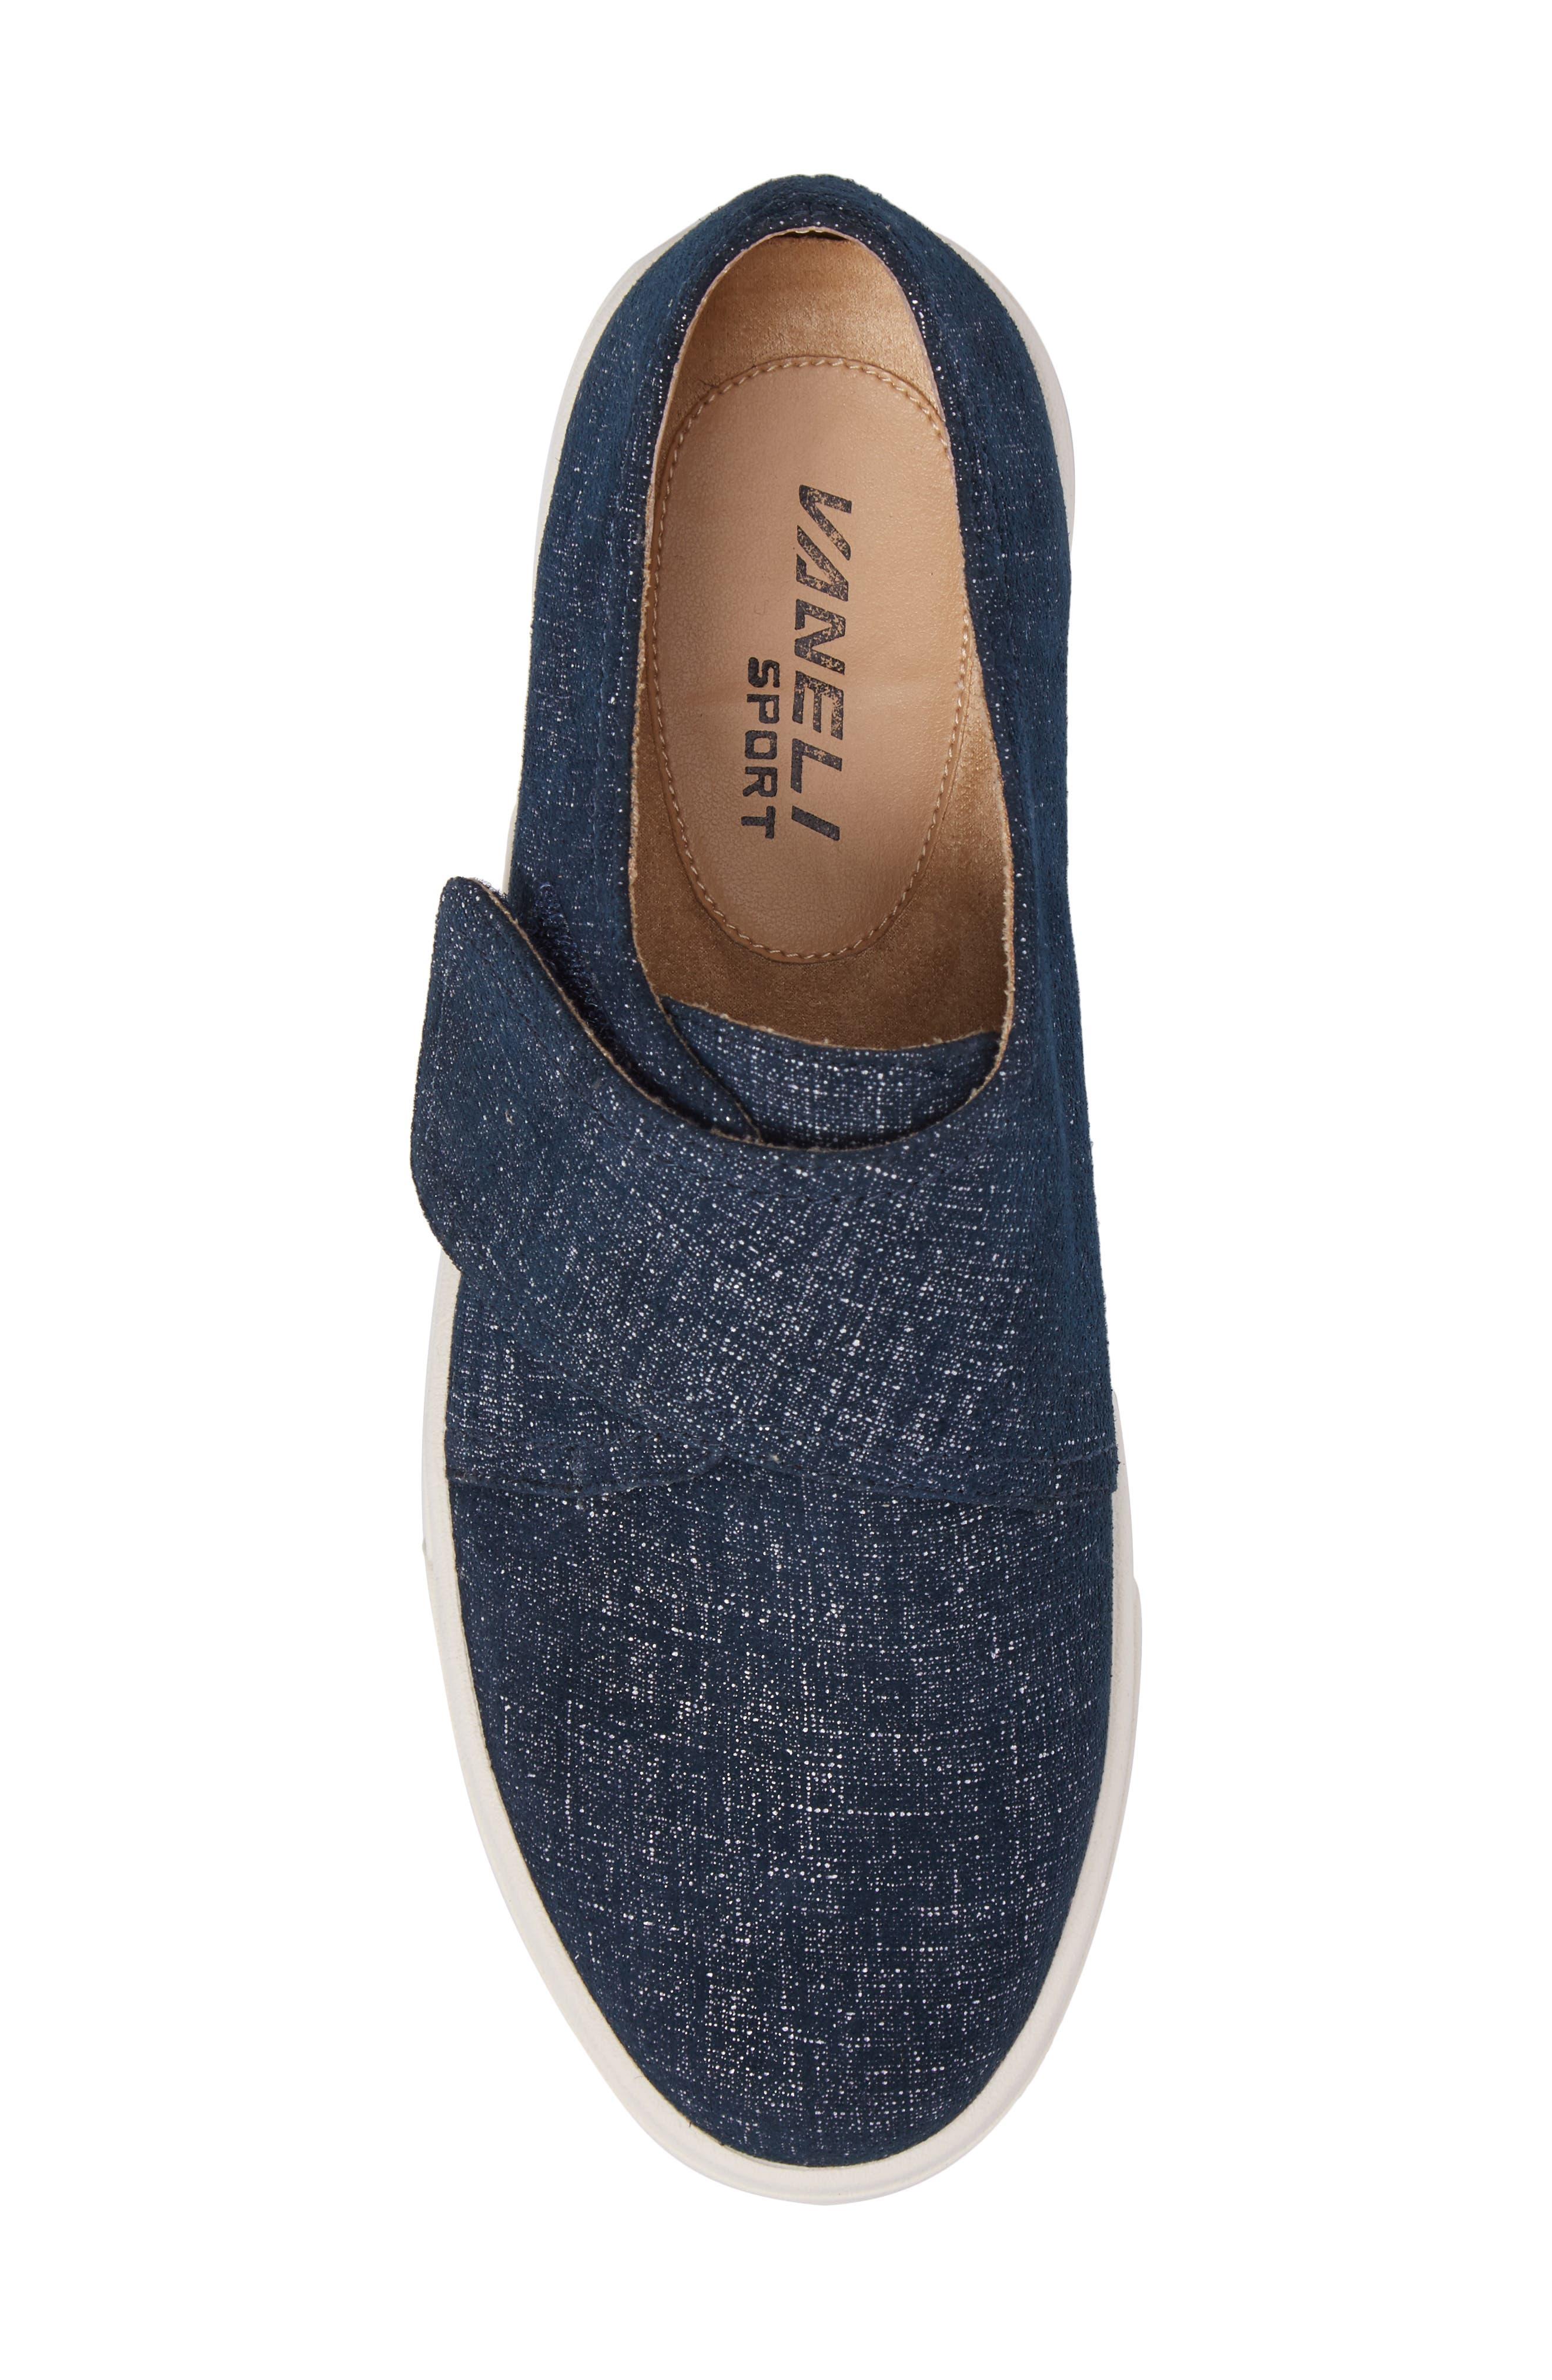 VANELI,                             Oberon Slip-On Sneaker,                             Alternate thumbnail 5, color,                             JEANS PRINTED SUEDE